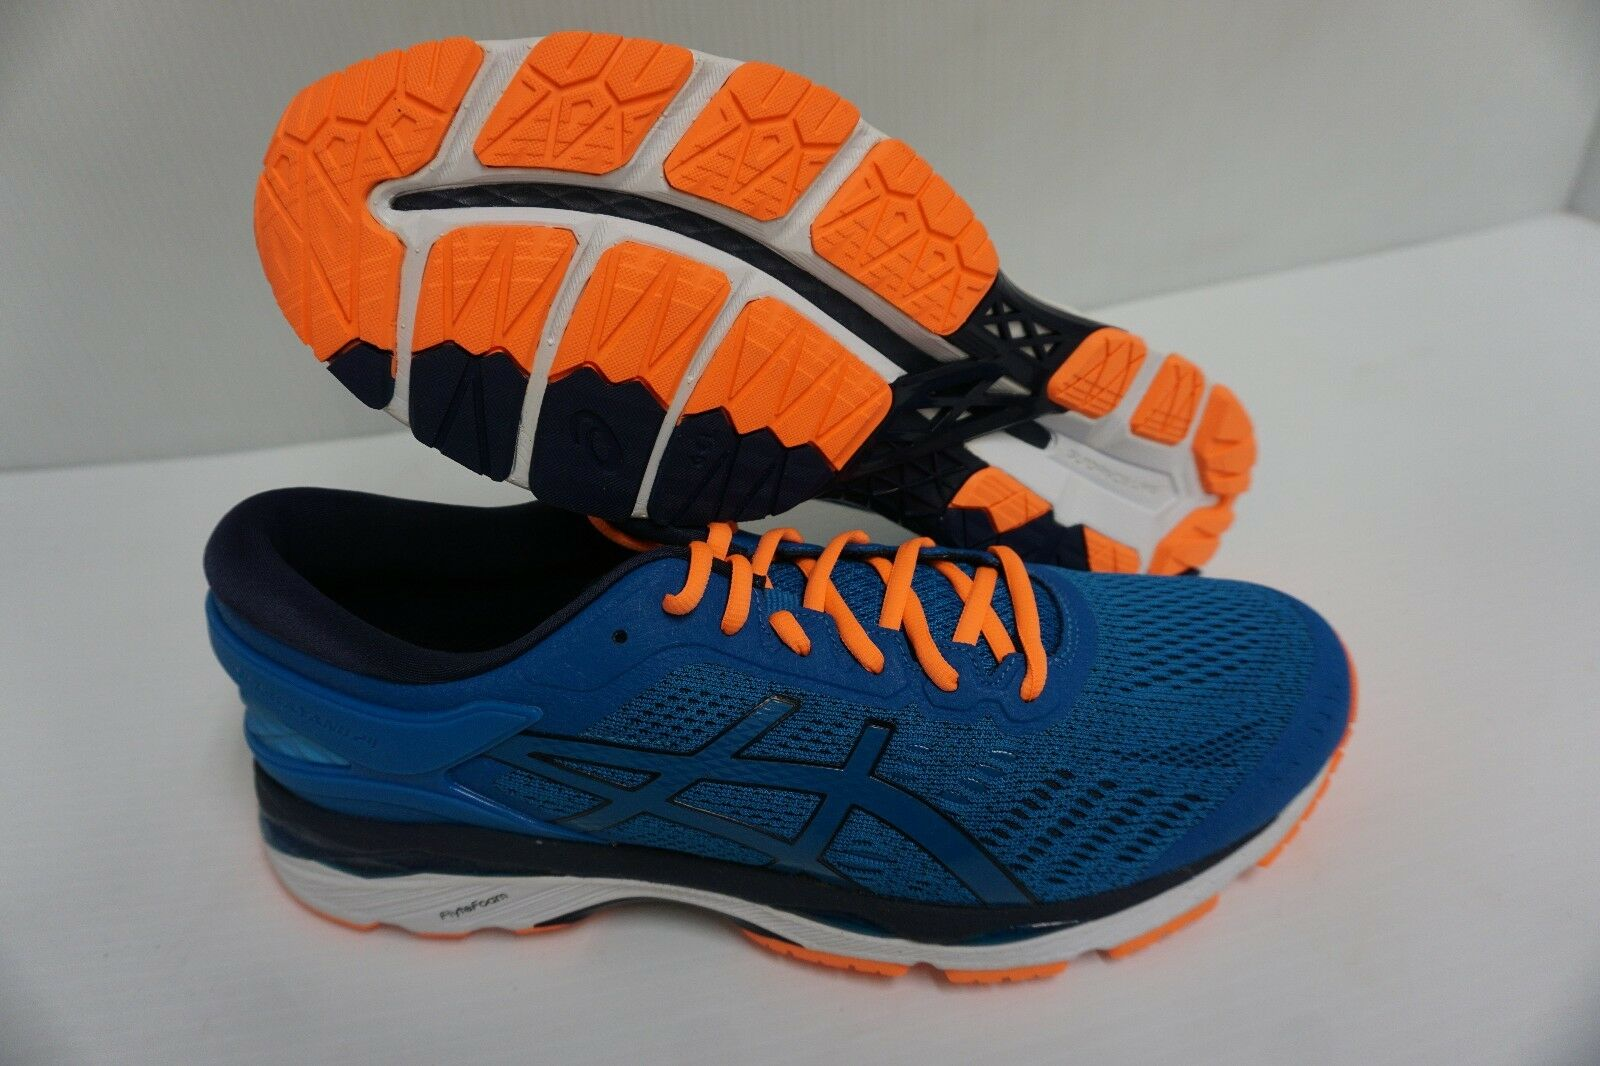 Asics men's gel kayano 24 running shoes directoire blue hot orange size 10 us